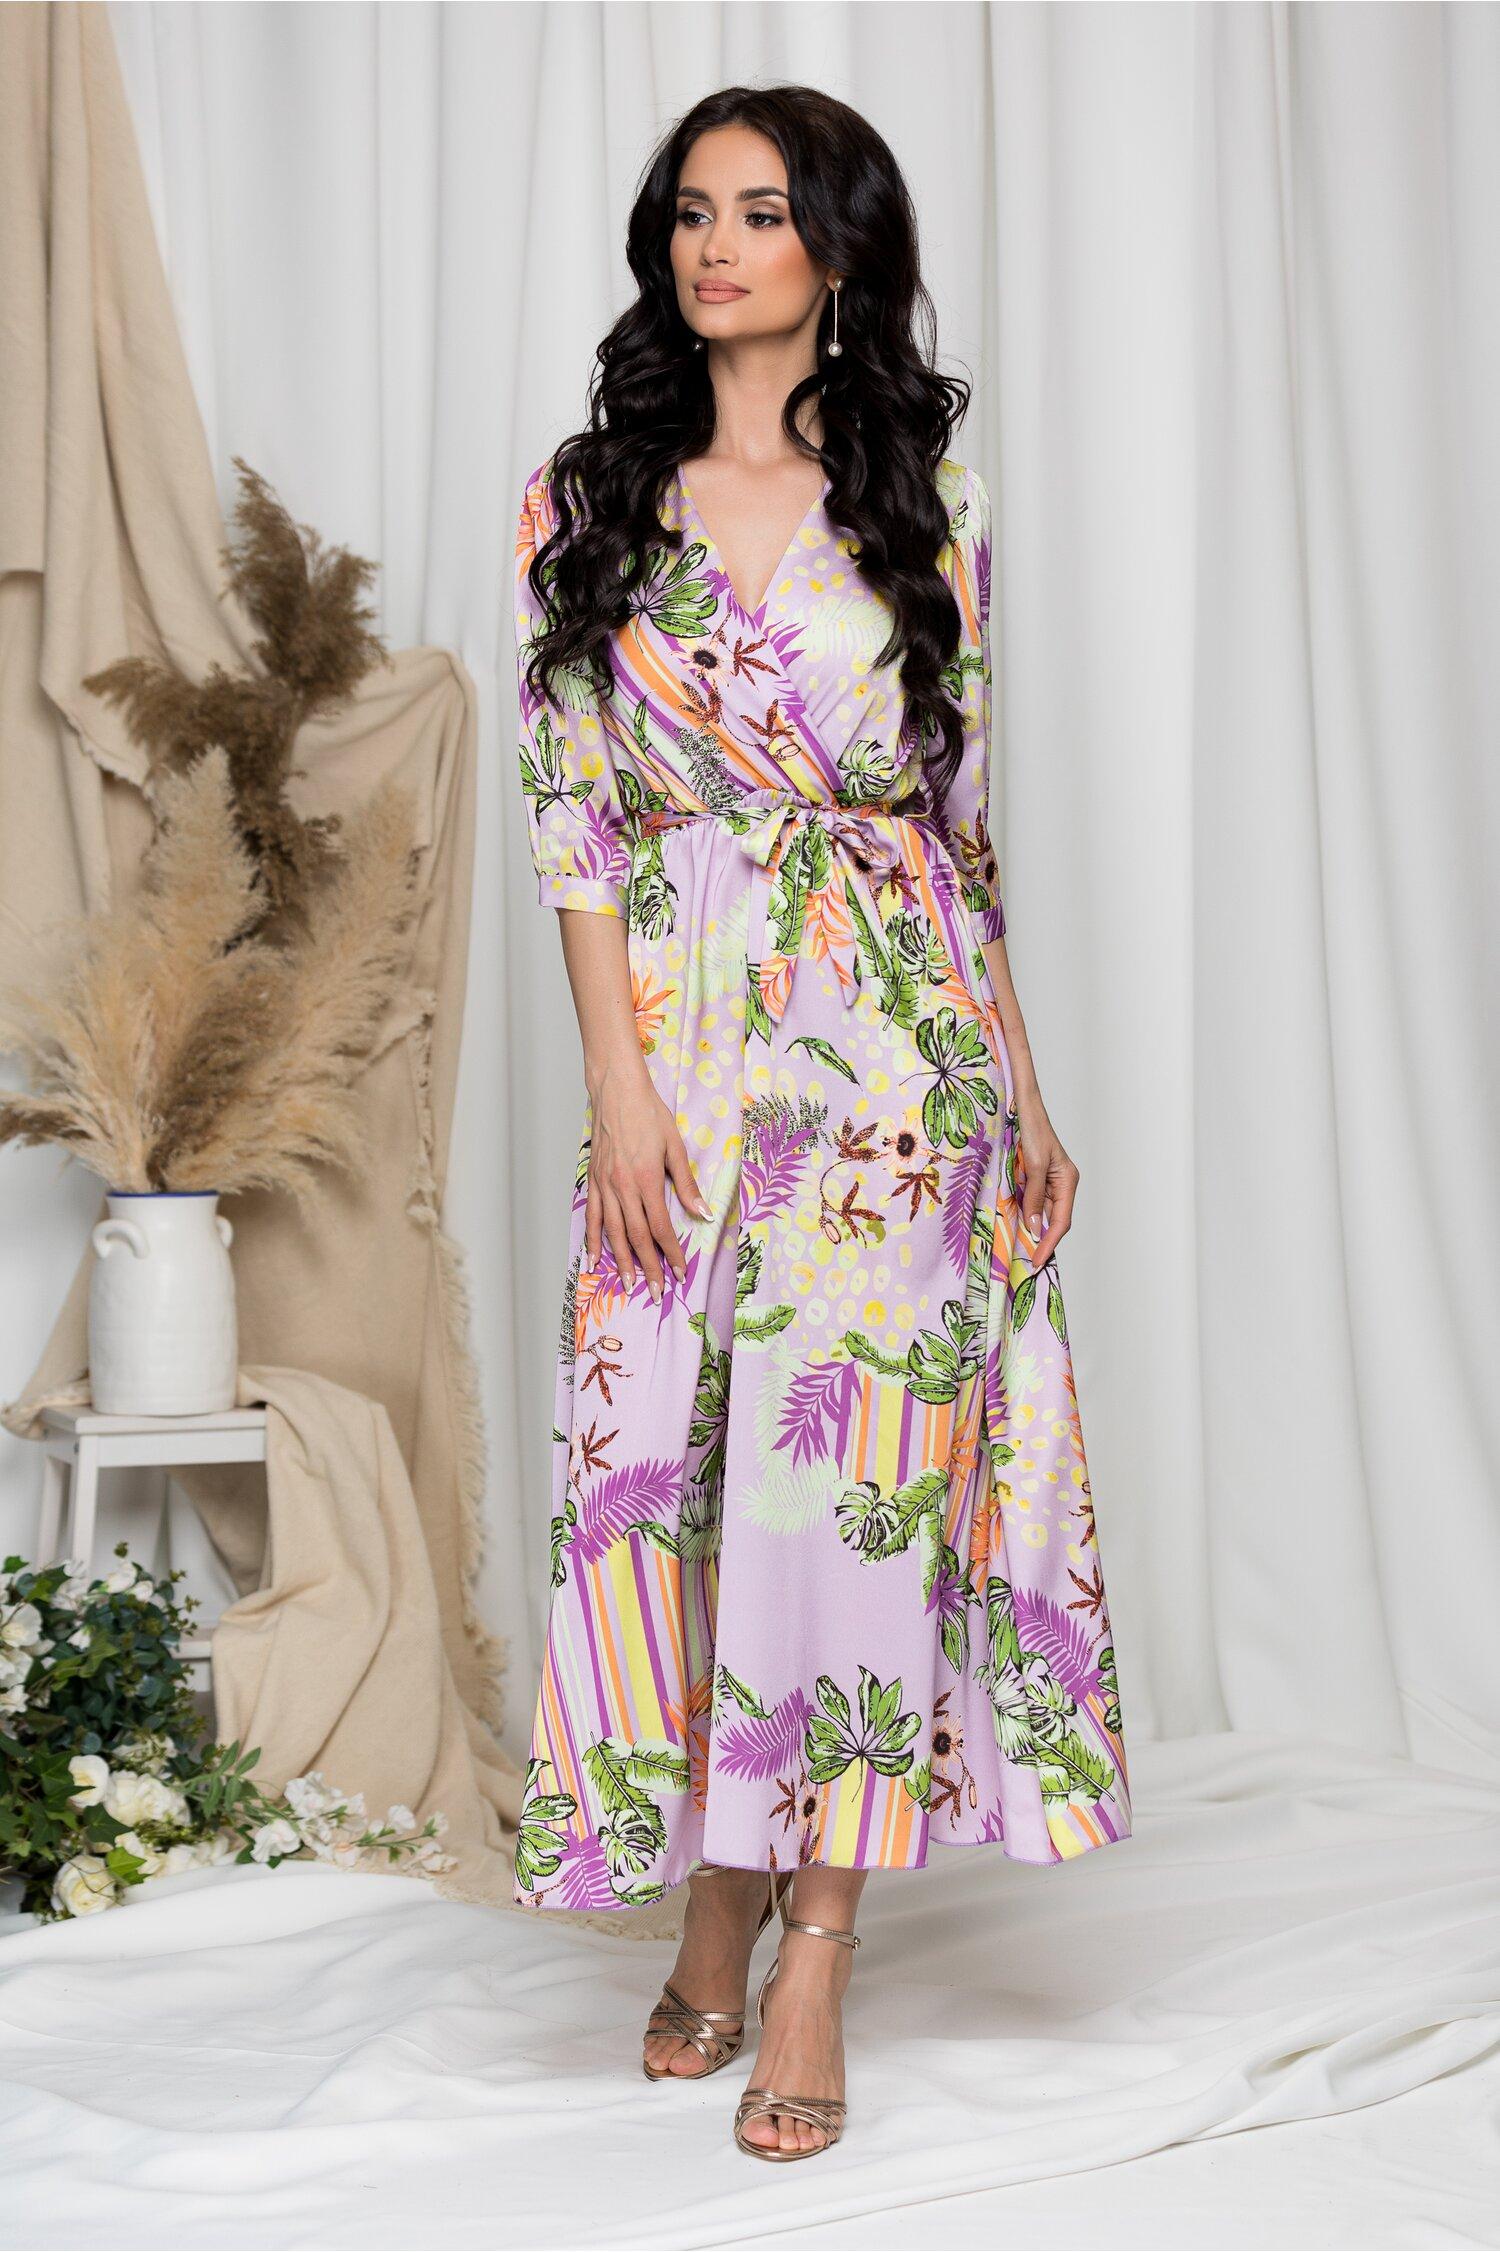 Rochie Vivi lila cu imprimeu exotic imagine dyfashion.ro 2021